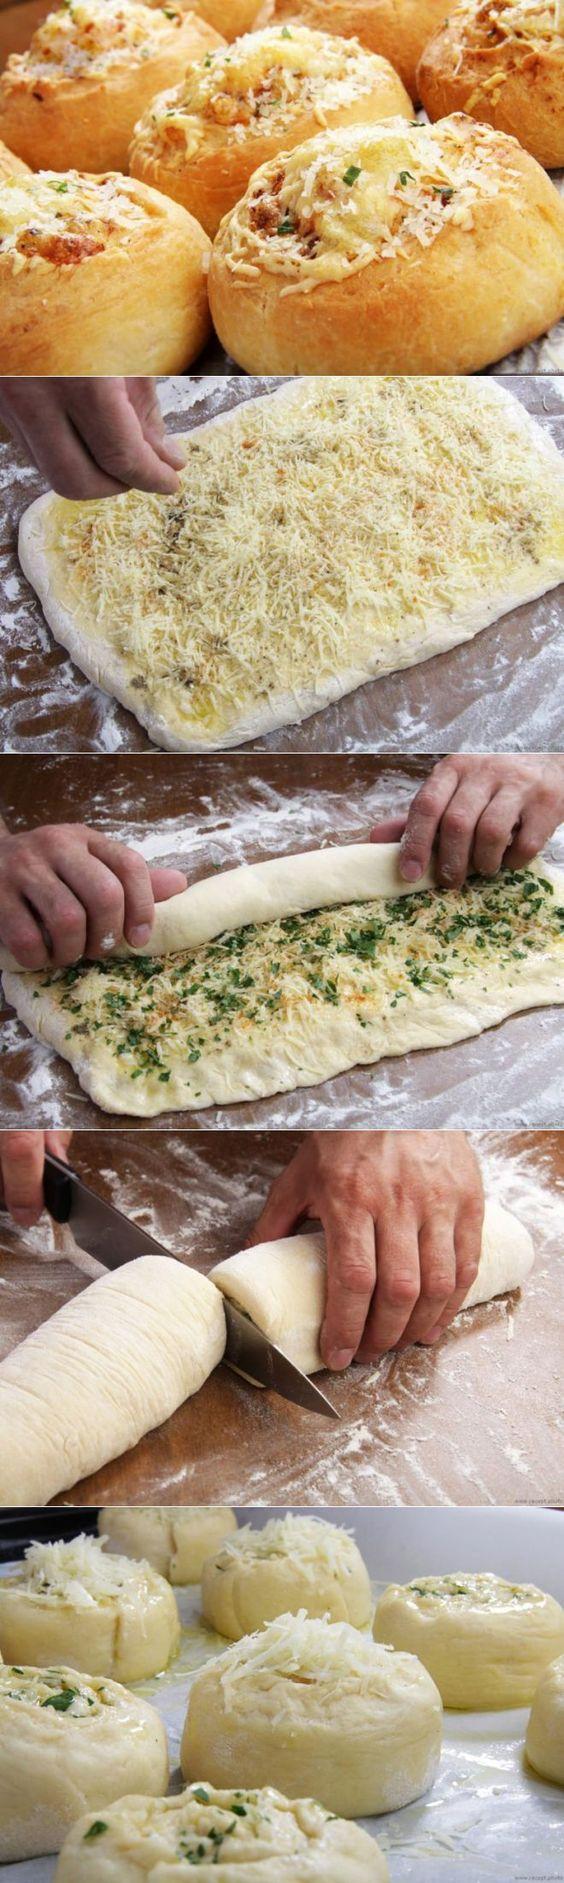 Булочки с сыром из дрожжевого теста